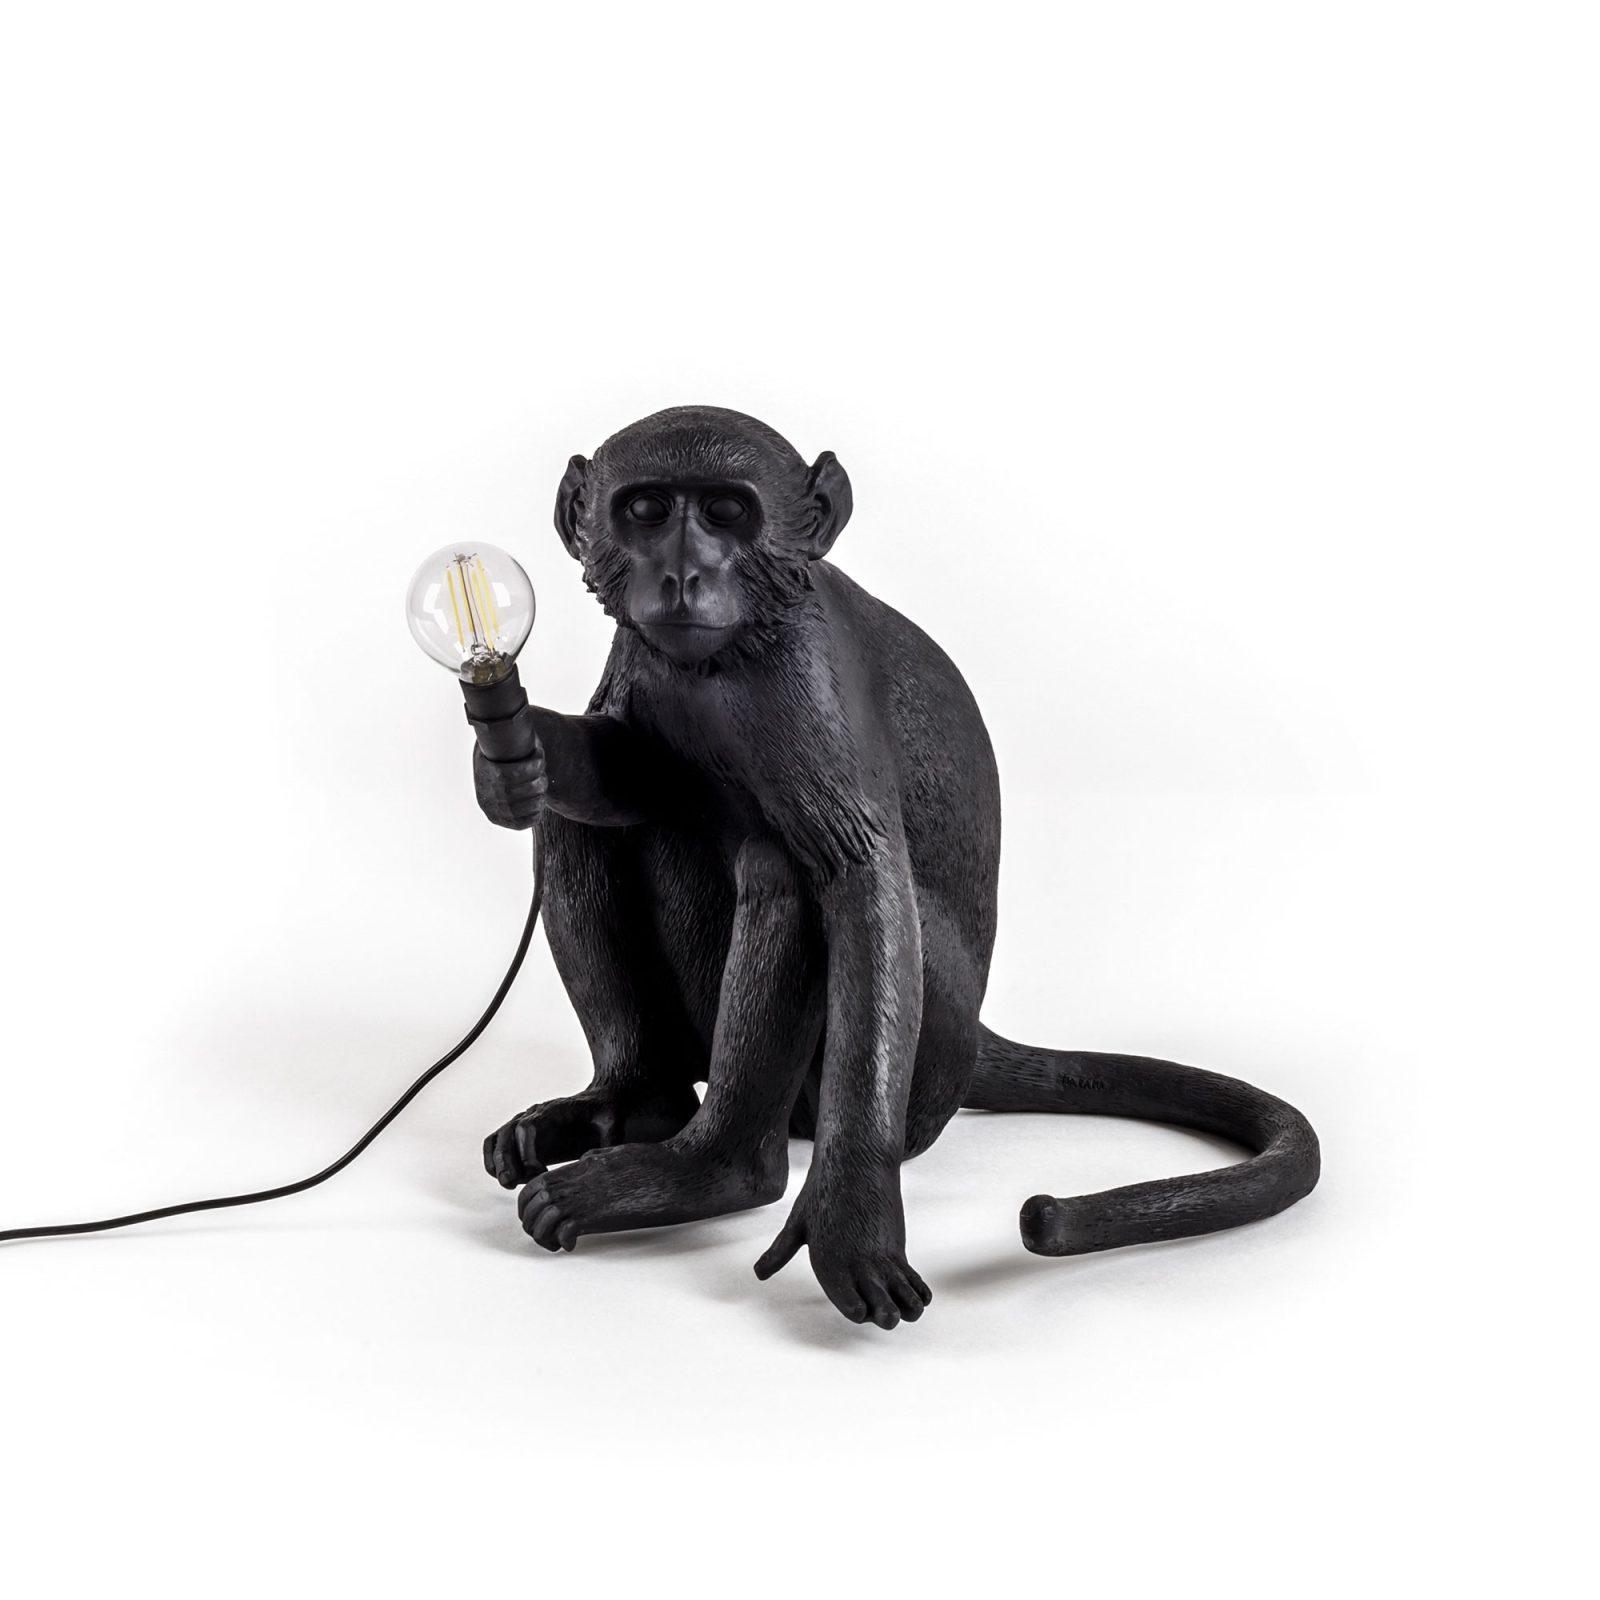 Seletti Outdoor Monkey Lamp, Sitting -31194